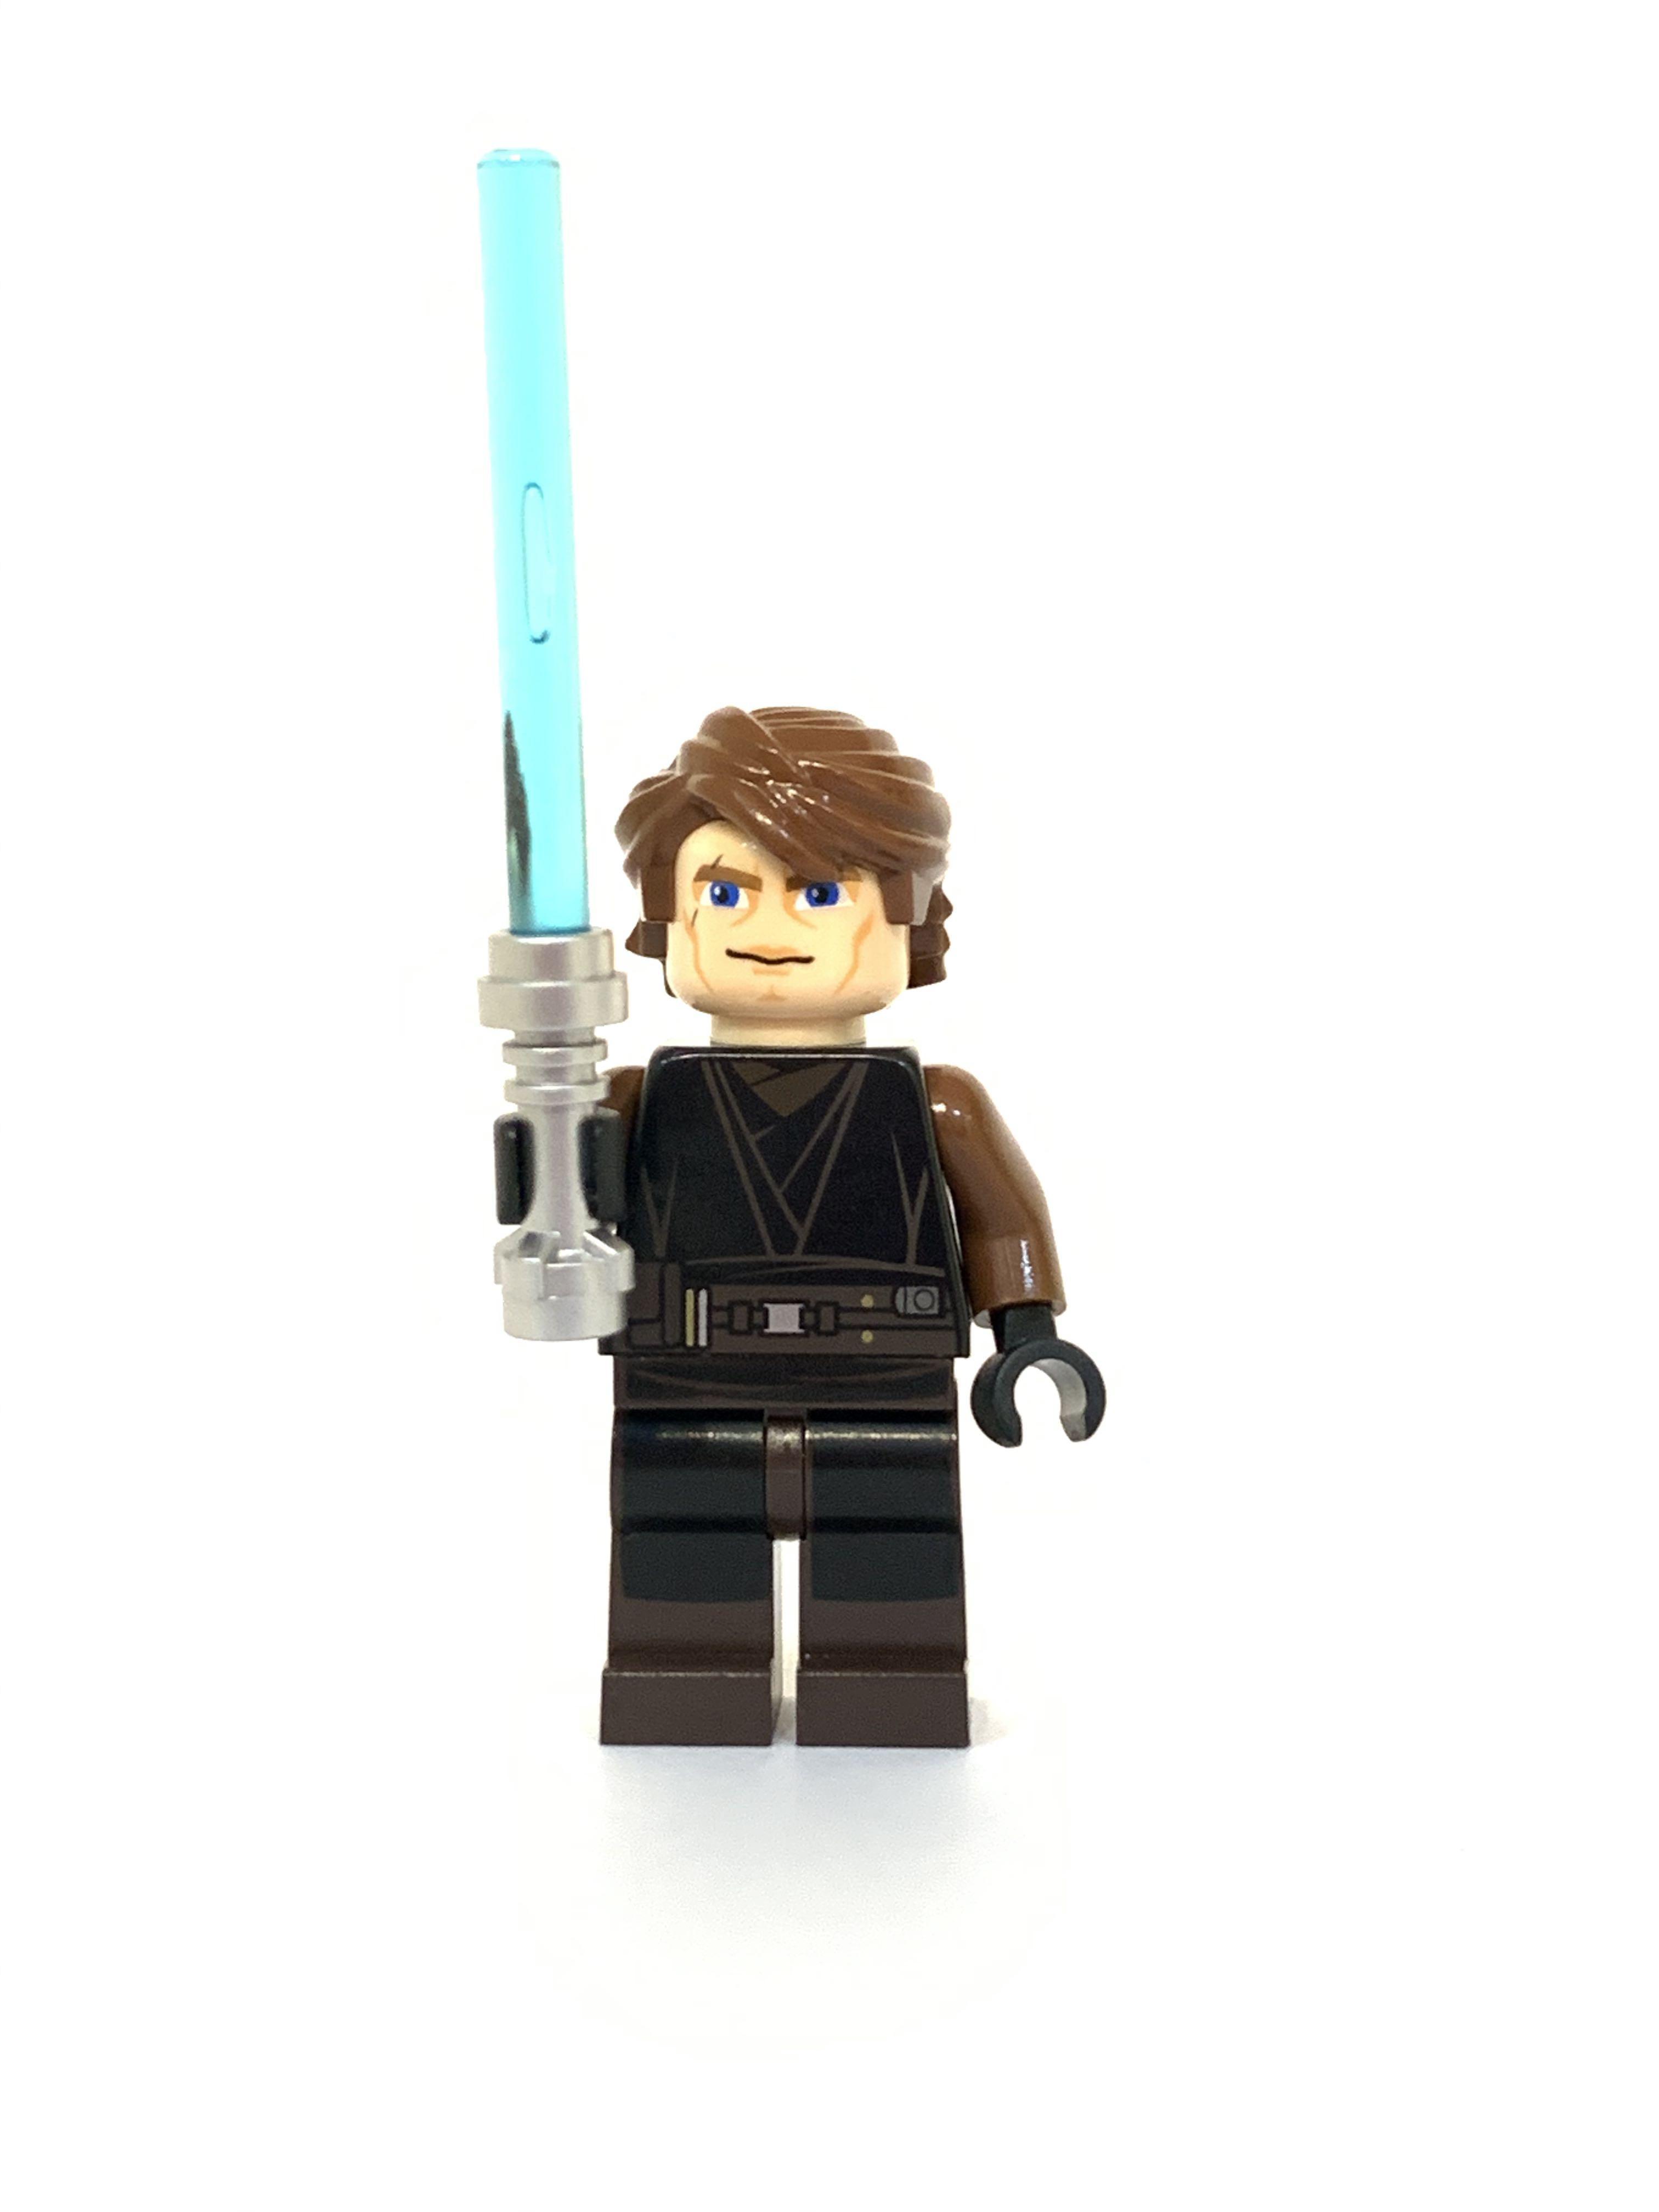 Lego Star Wars Anakin Skywalker Clone Wars Toys Games Blocks Building Toys On Carousell